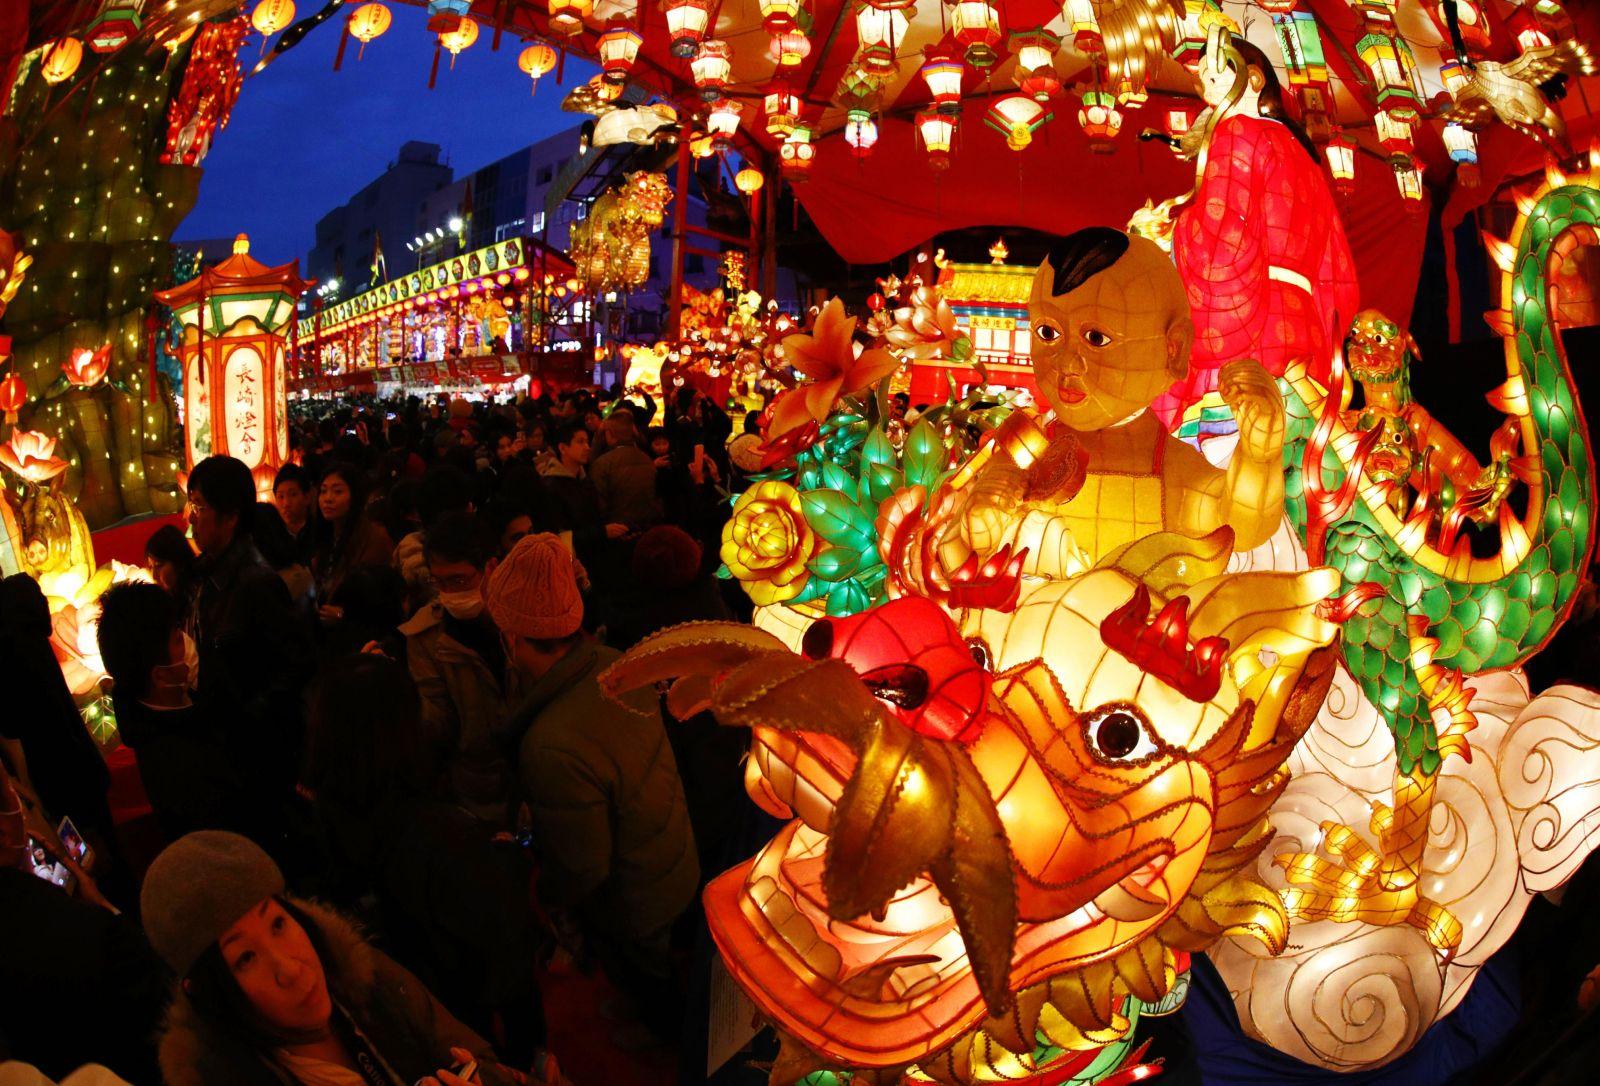 Nagasaki Lantern Festival 2019 Turns City Into Magical Spirited Away Experience